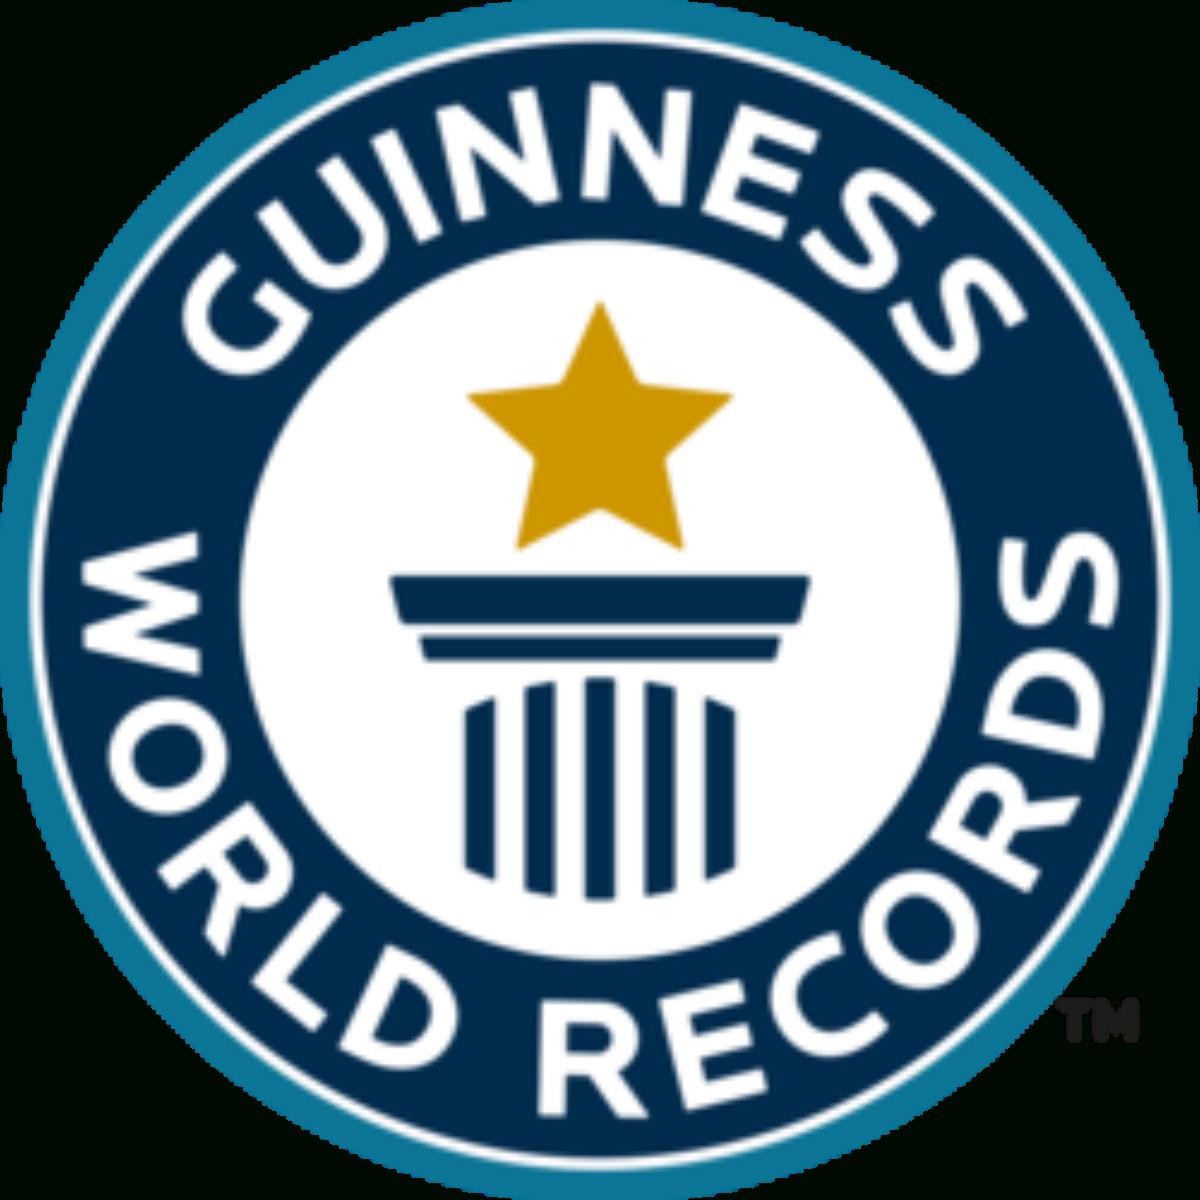 Guinness World Records  Wikipedia Regarding Guinness World Record Certificate Template